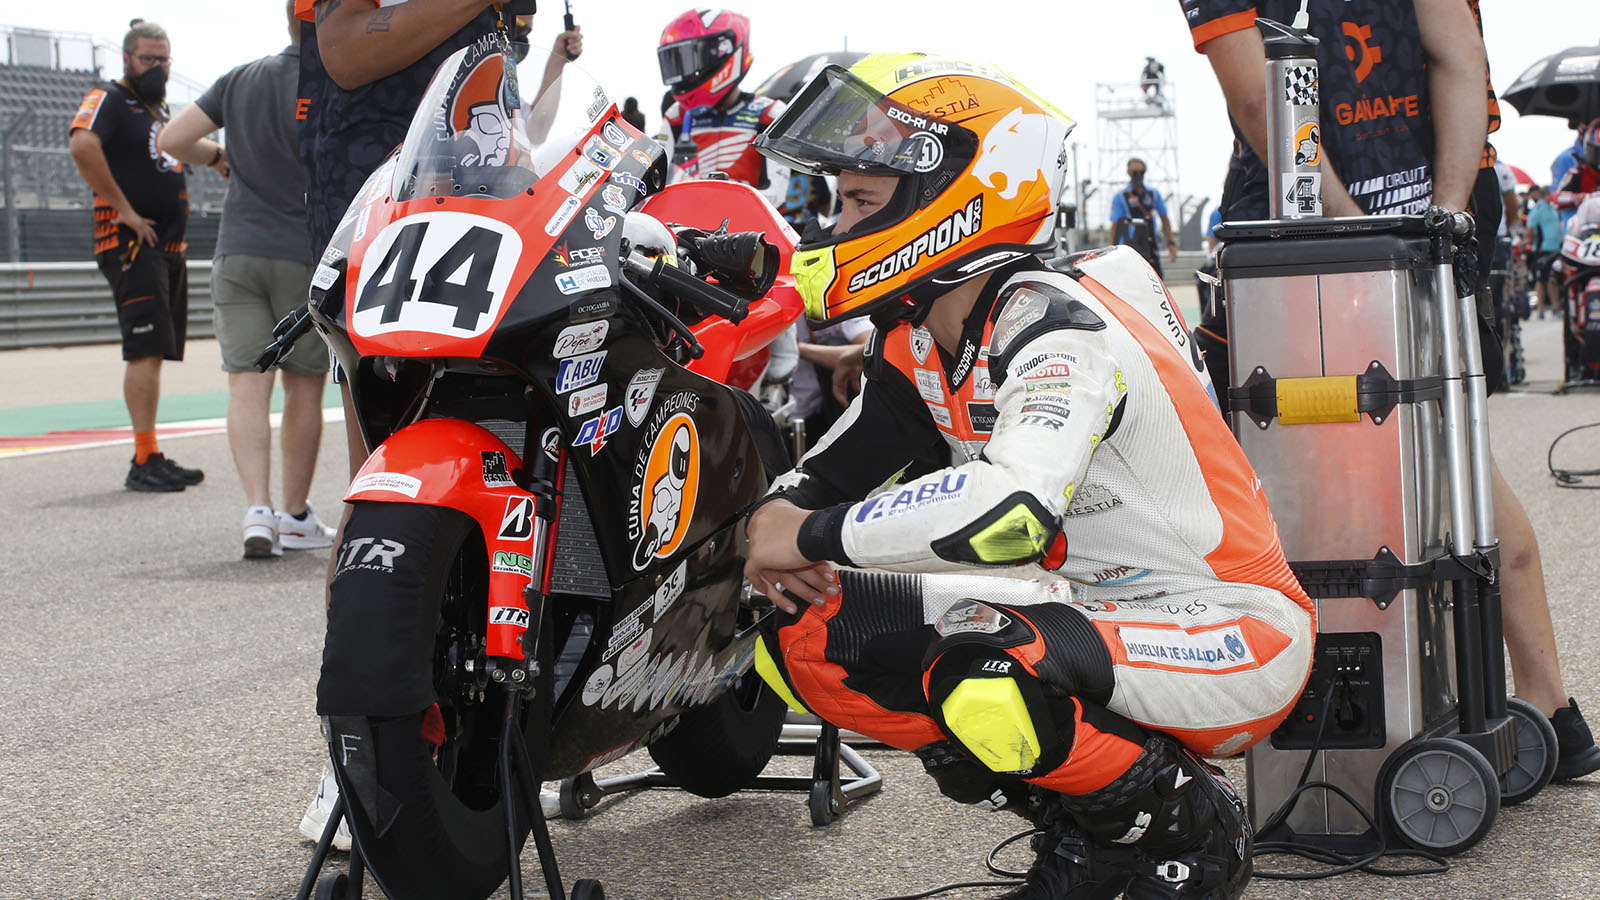 Motorcycle world mourns loss of Hugo Millán at MotorLand Aragón